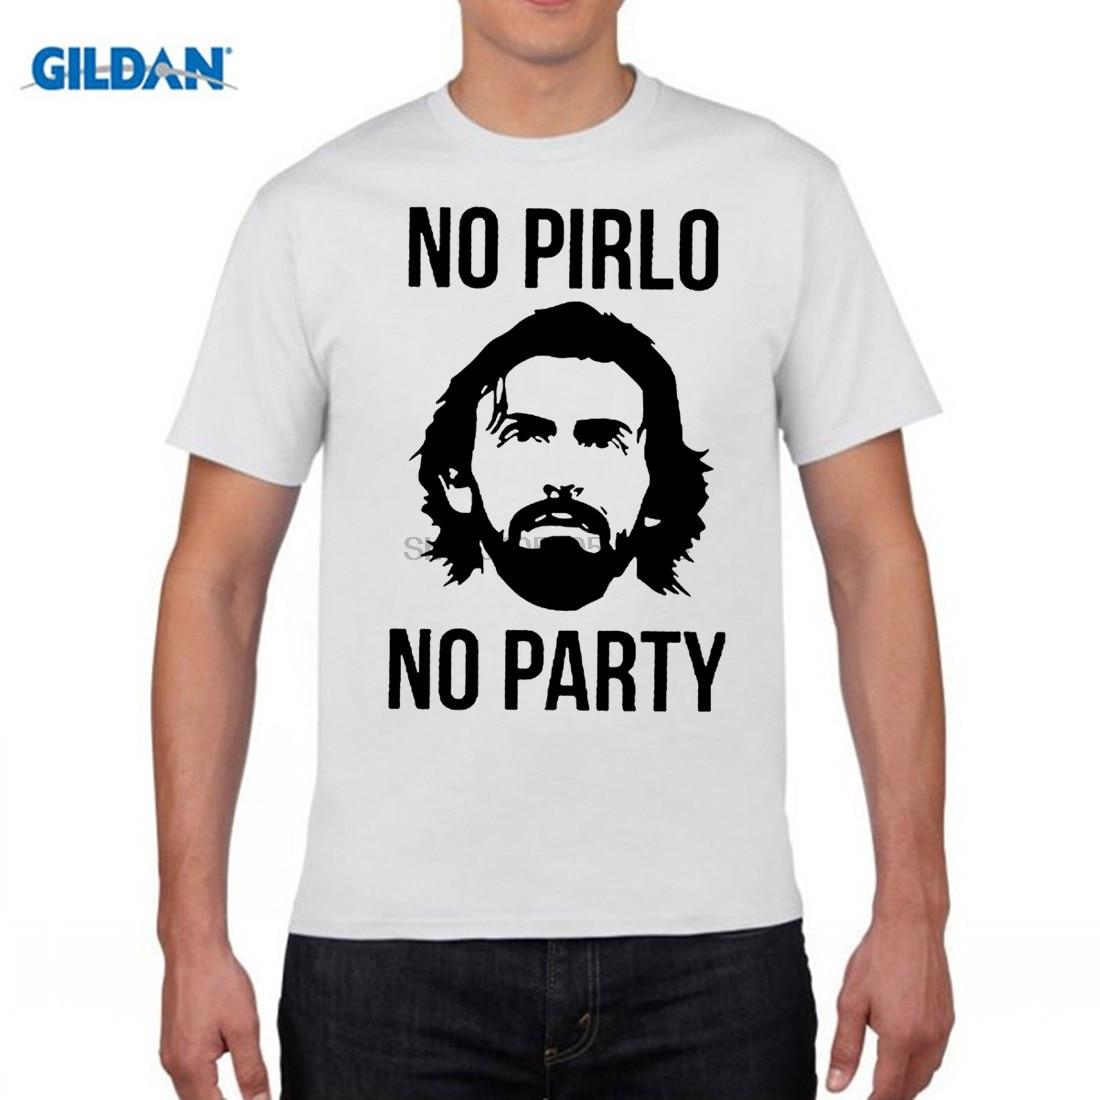 GILDAN funny men t shirt New Fashion Mens T shirts Andrea Pirlo cool Milan Serie A Italiana Italy Tees Cotton Clothing